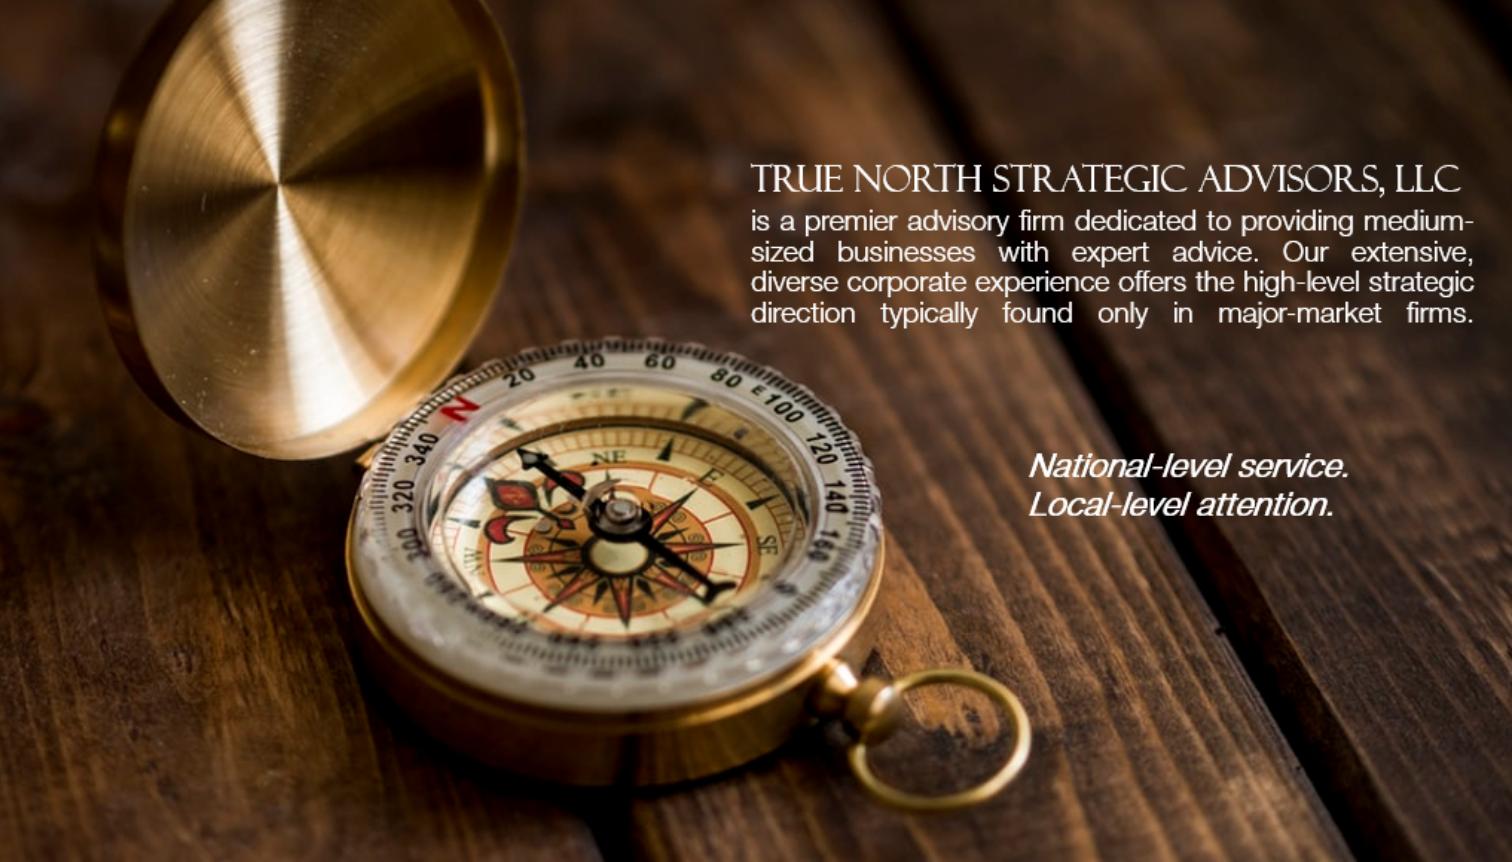 Compass unsplash with writing-Jul-23-2020-05-45-56-38-PM-1